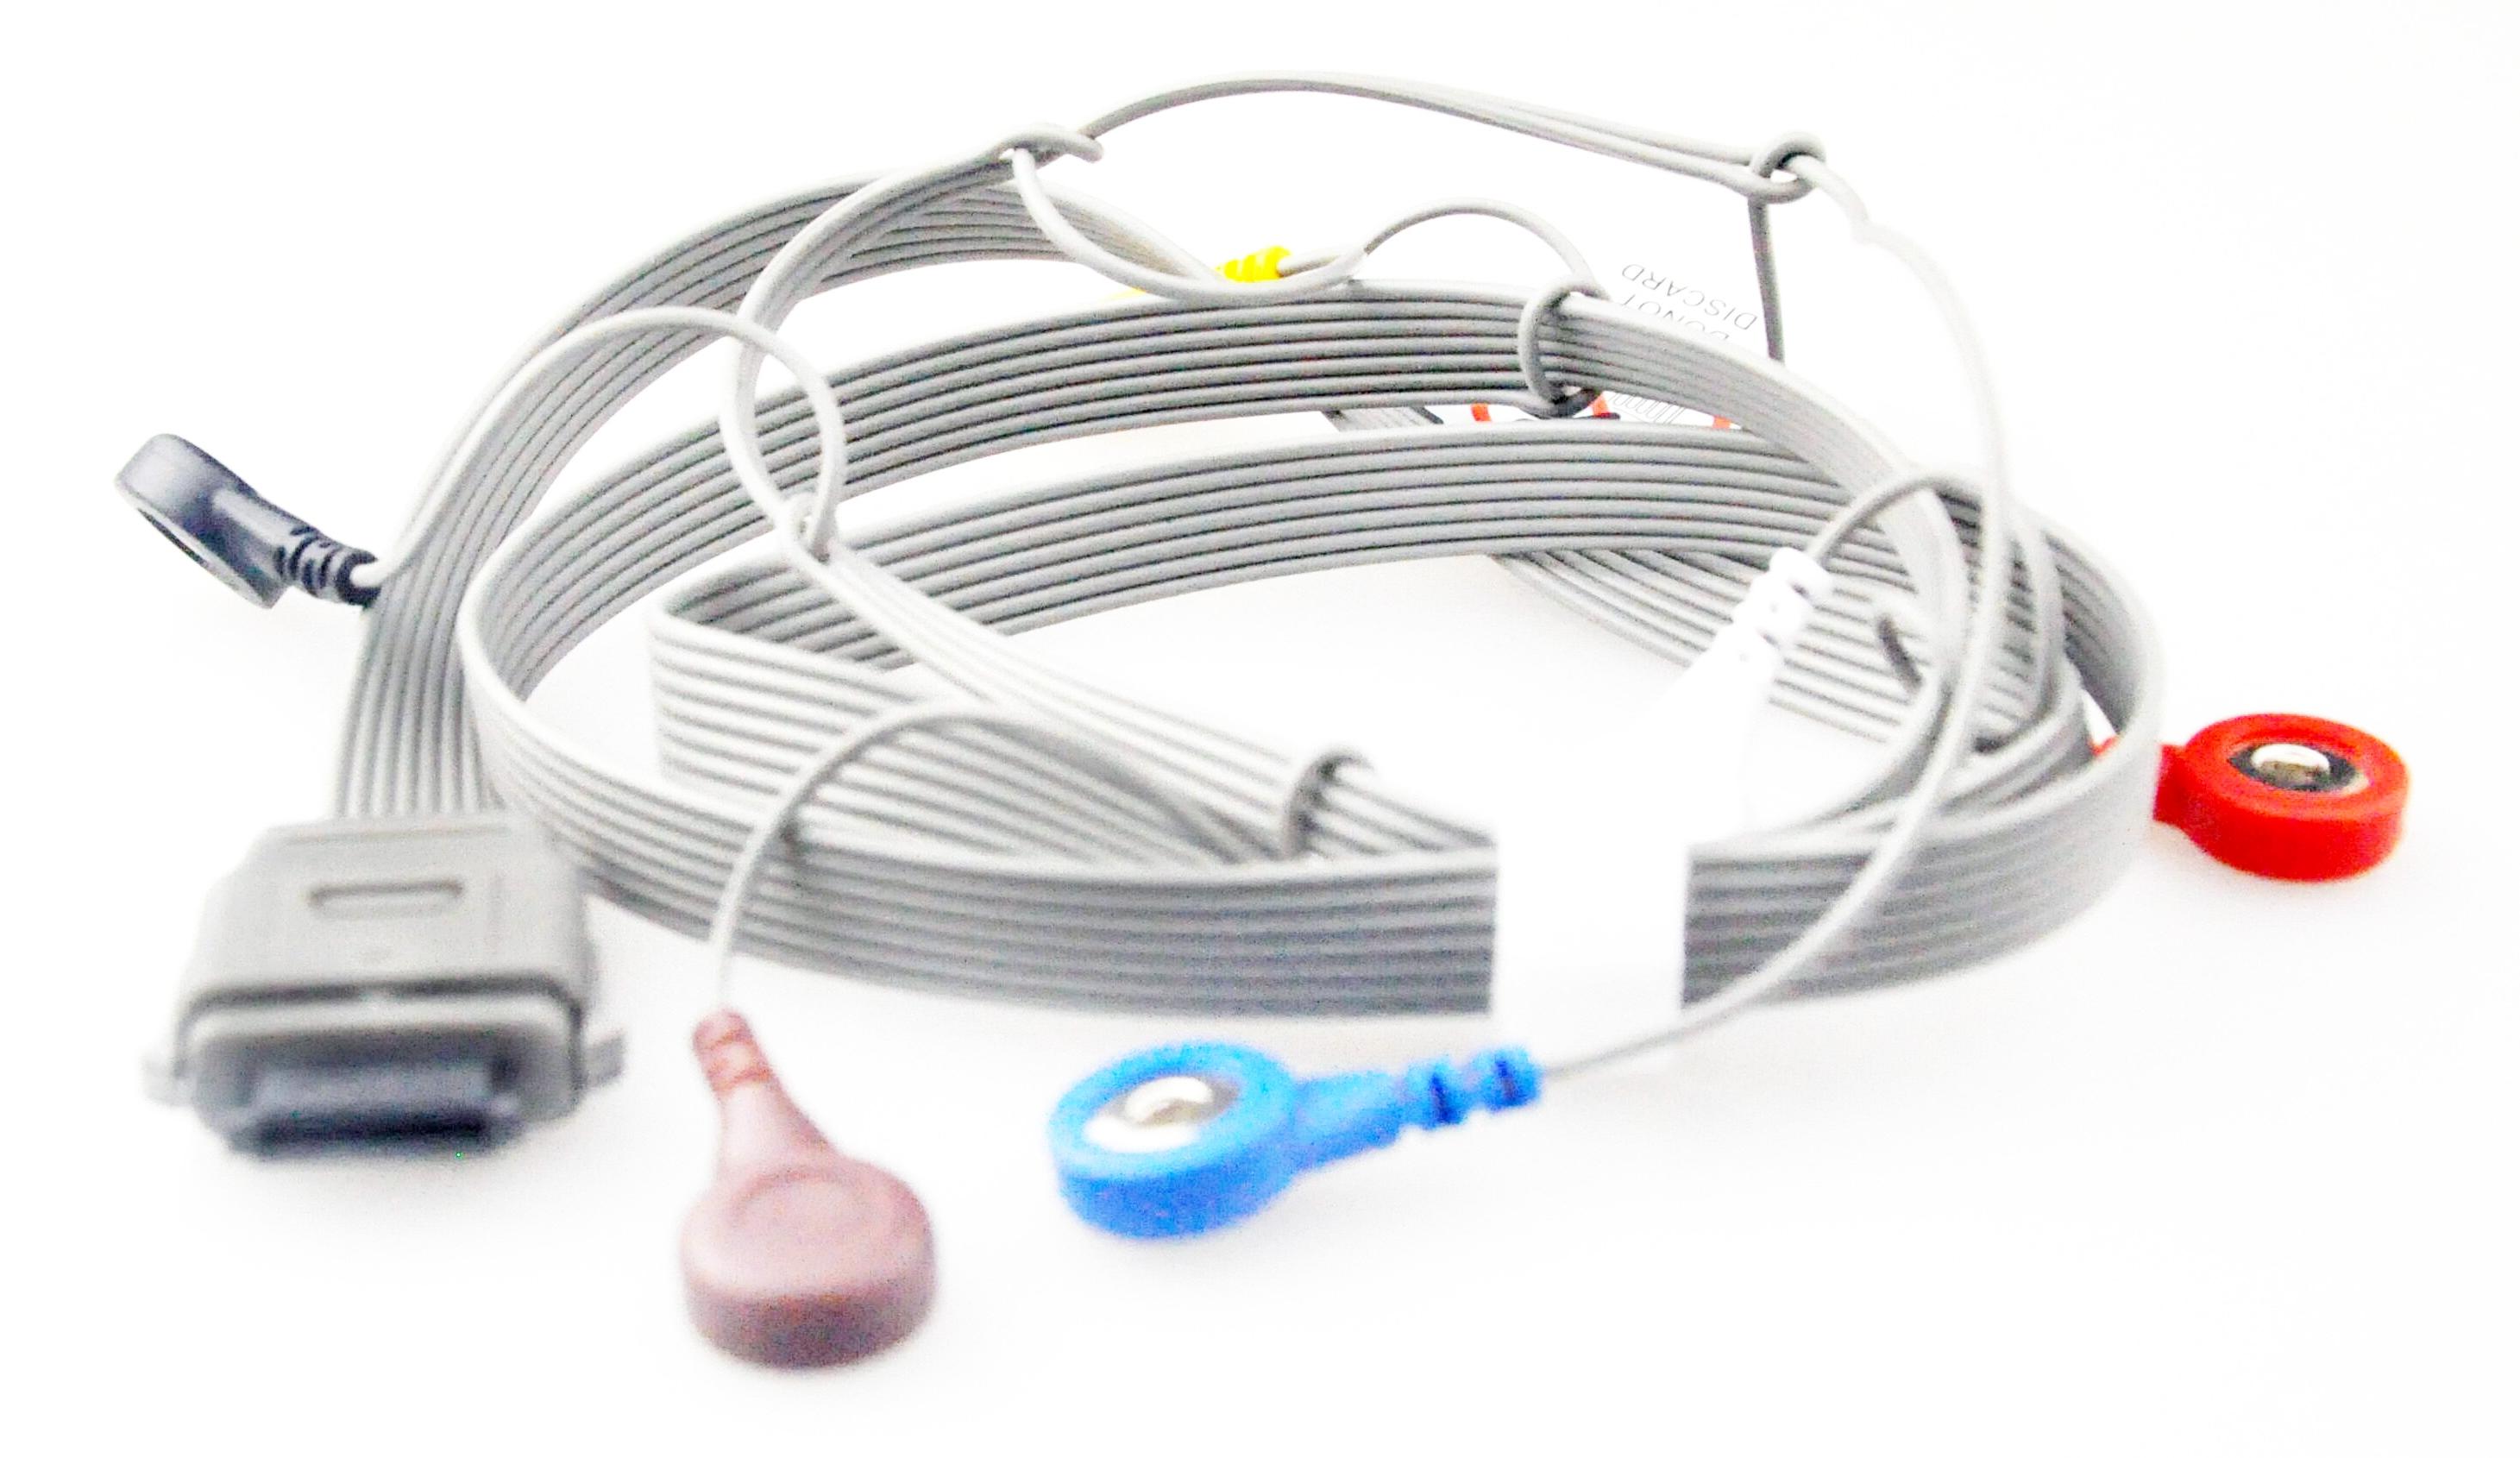 Ziemlich Bi Draht Lautsprecherkabel Bilder - Elektrische Schaltplan ...